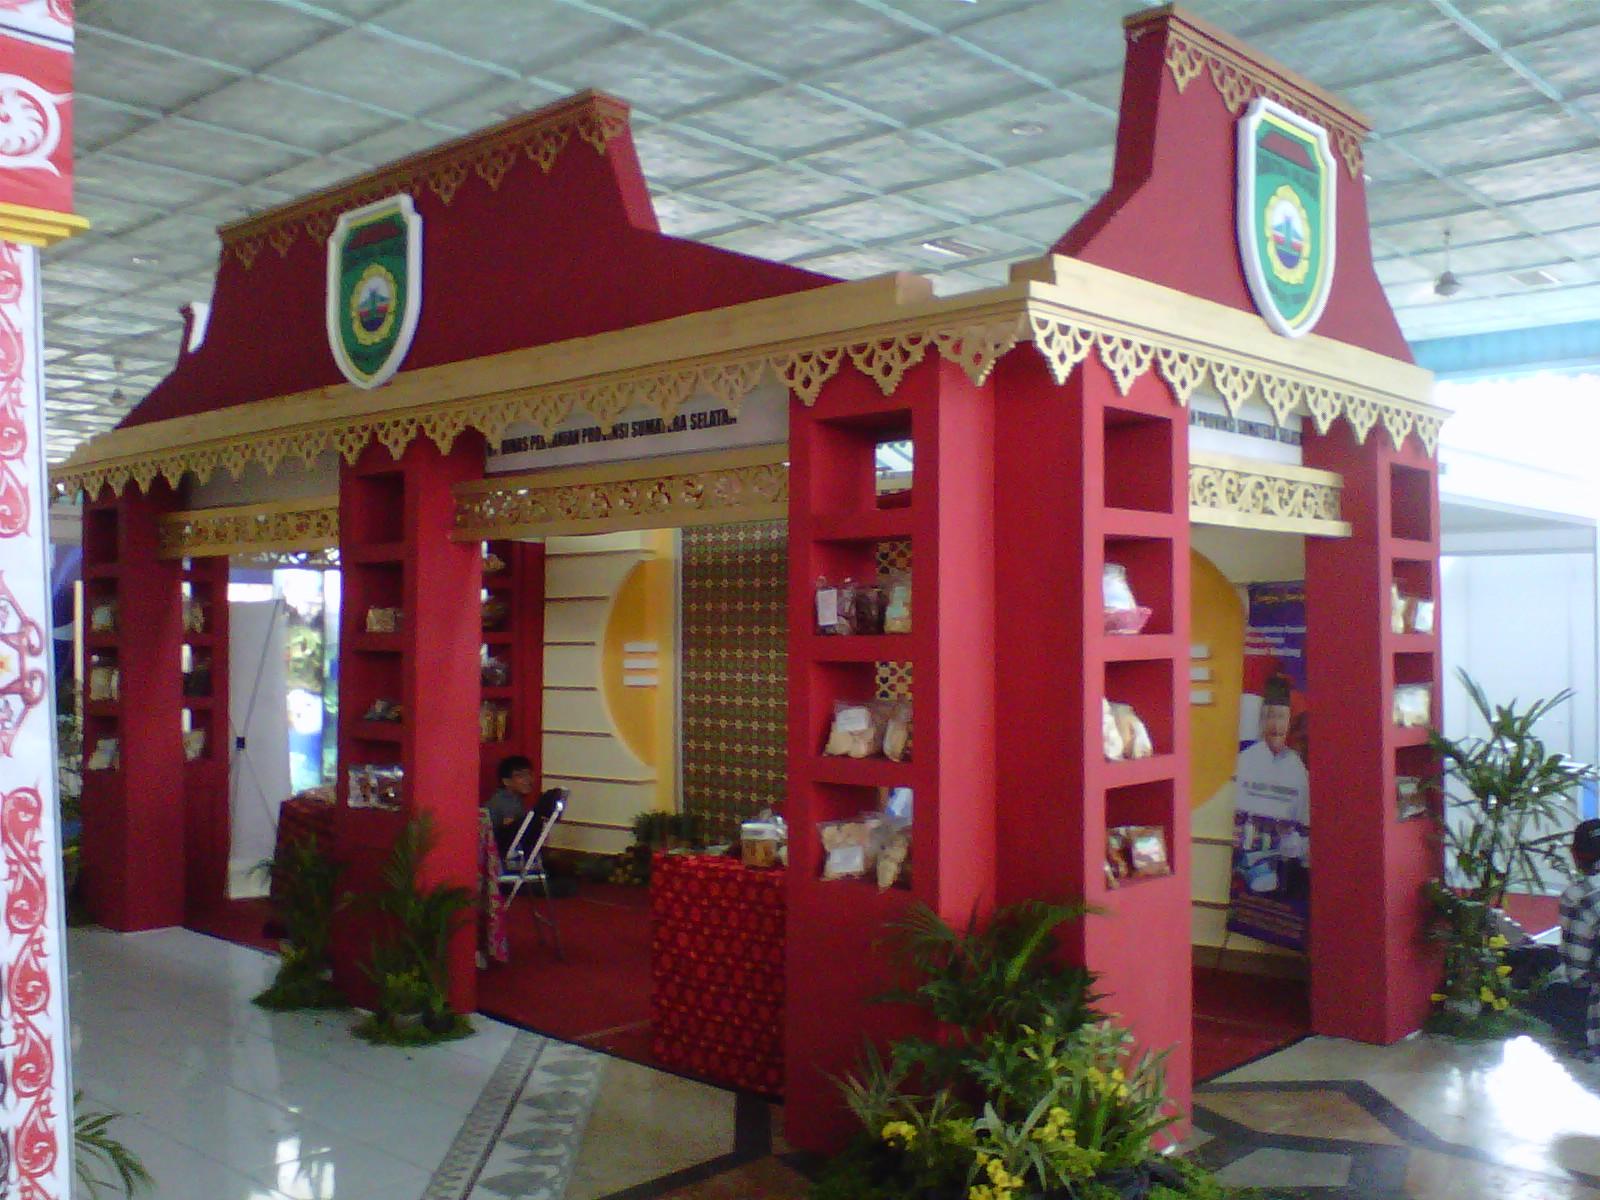 Dekorasi solo asmoro decoration booth booth pameran java for Asmoro decoration